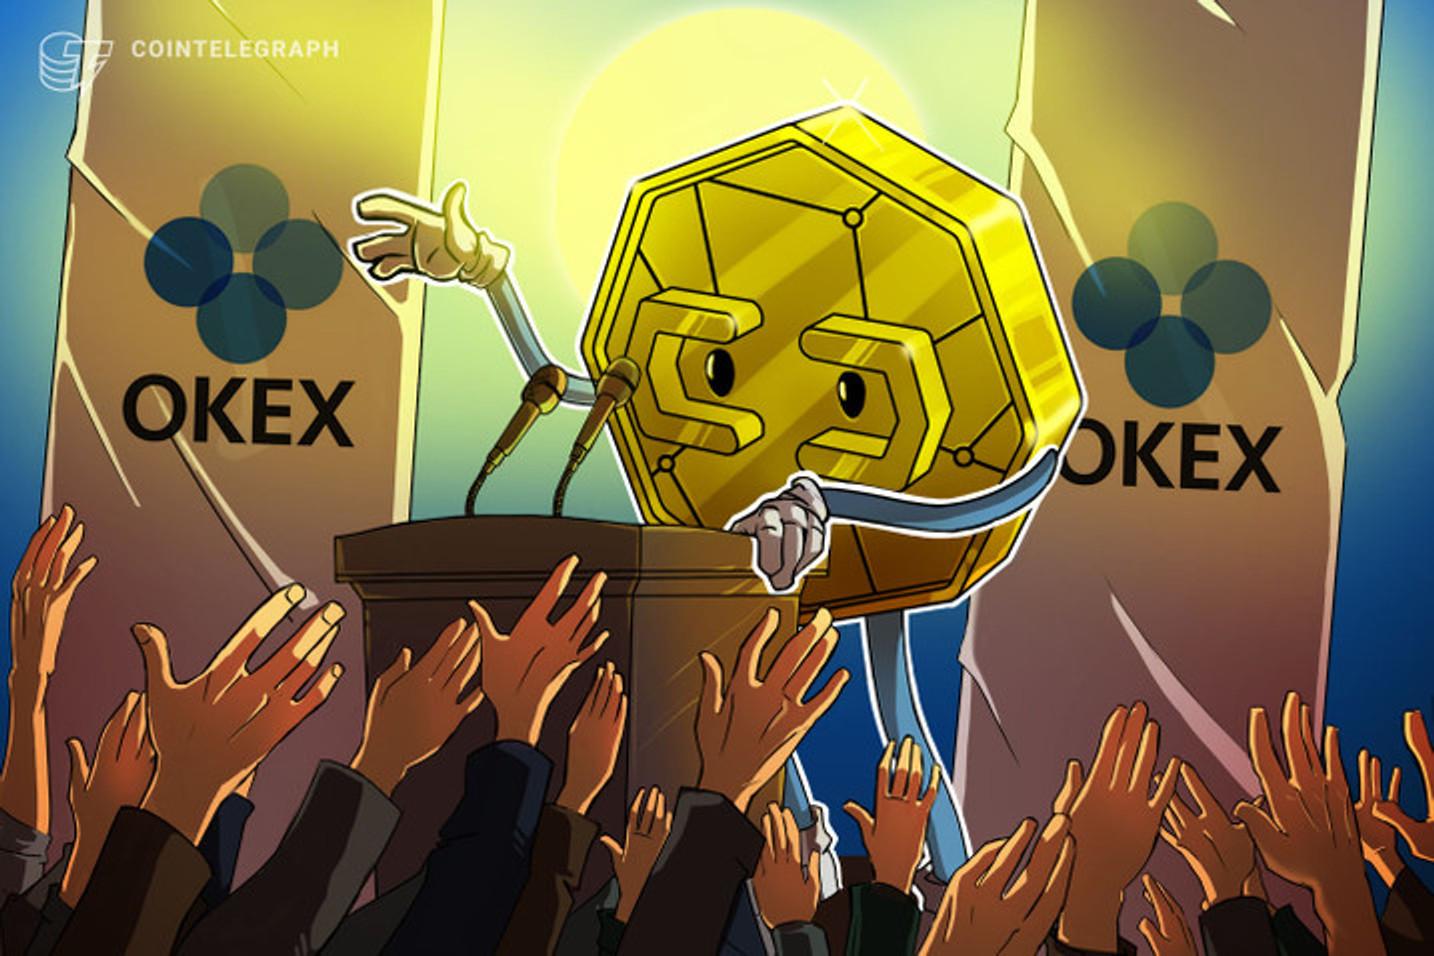 Vicepresidente de OKEx afirma que América Latina ha batido récords de adopción crypto en los últimos meses